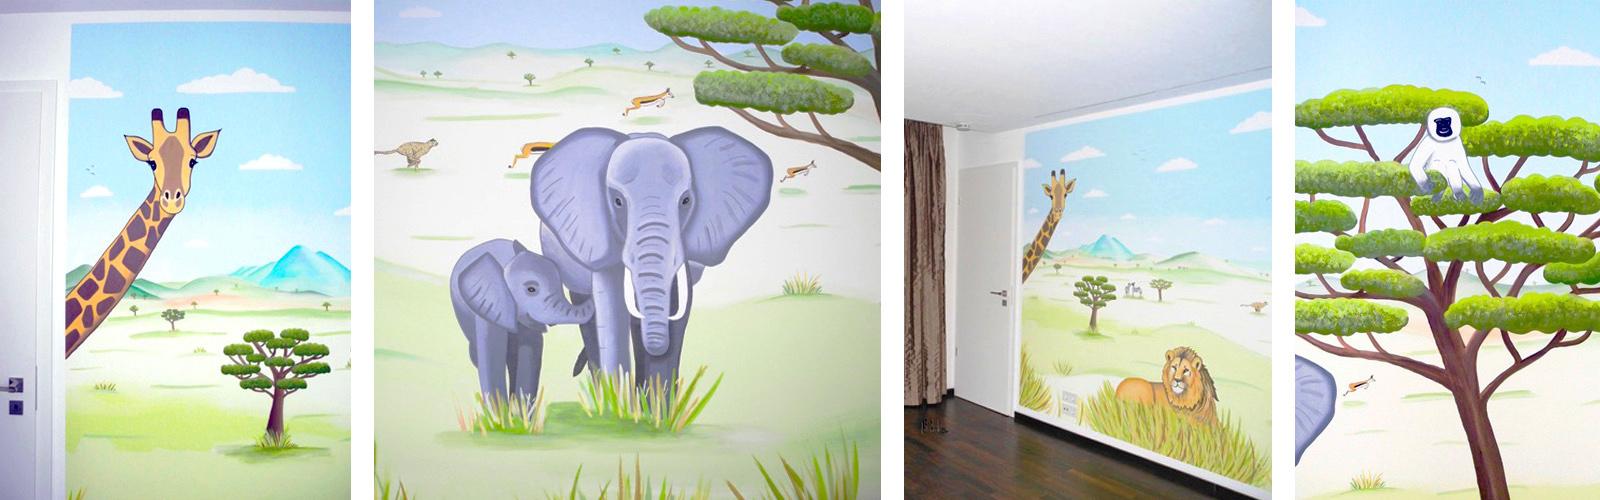 Sweetwall Wunschmotive Fur Deine Wand Wandmalerei Fur